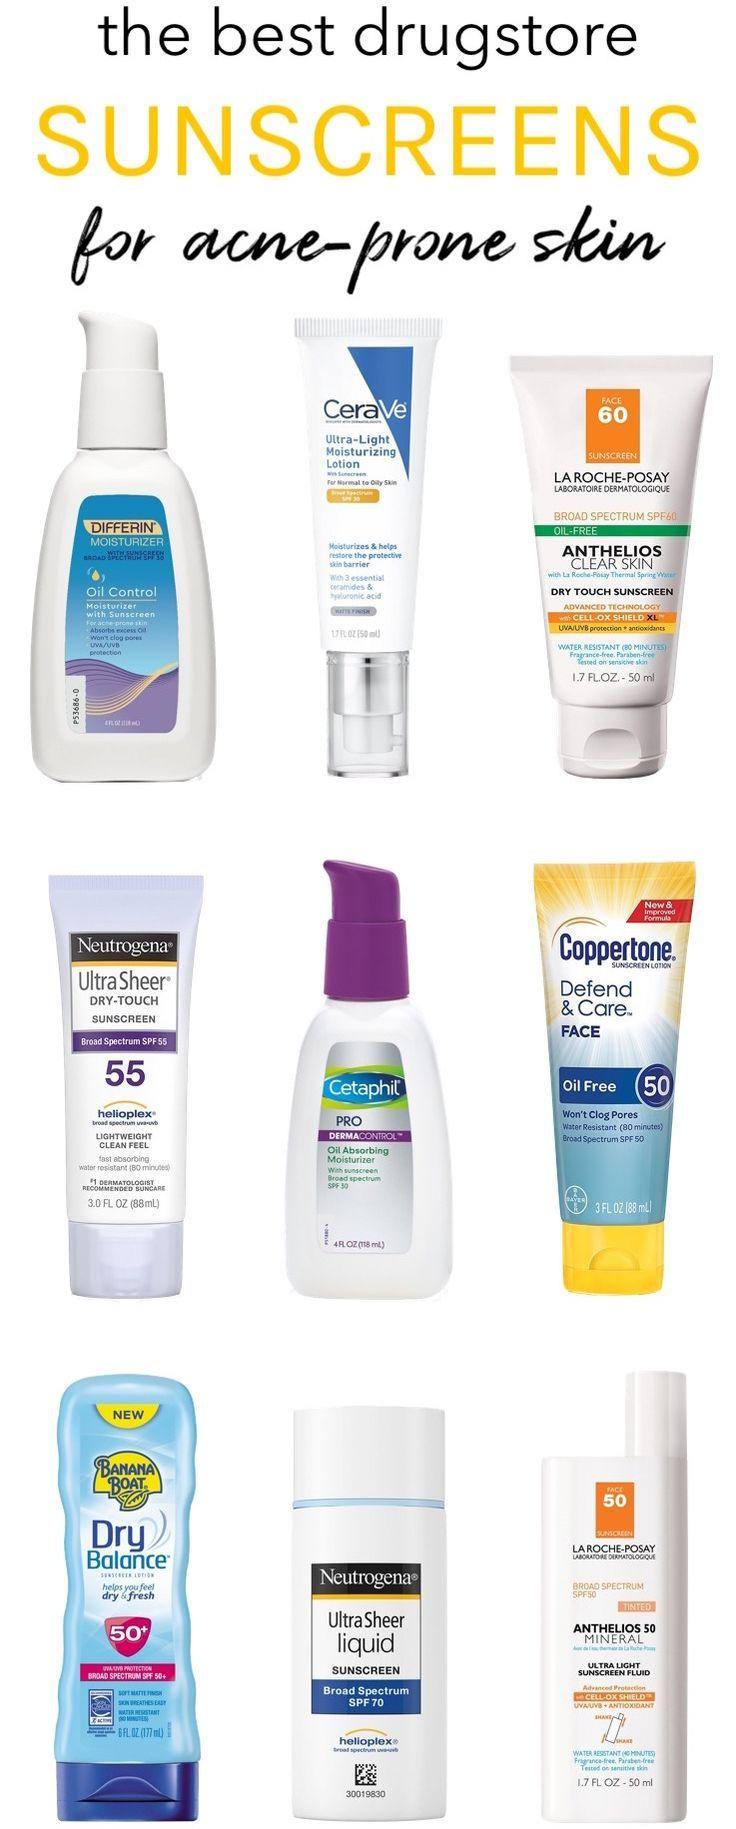 Best Drugstore Sunscreens For Acne Prone Skin Breakouts Be Gone Best Drugstore Sunscreen Acne Prone Skin Oily Skin Care